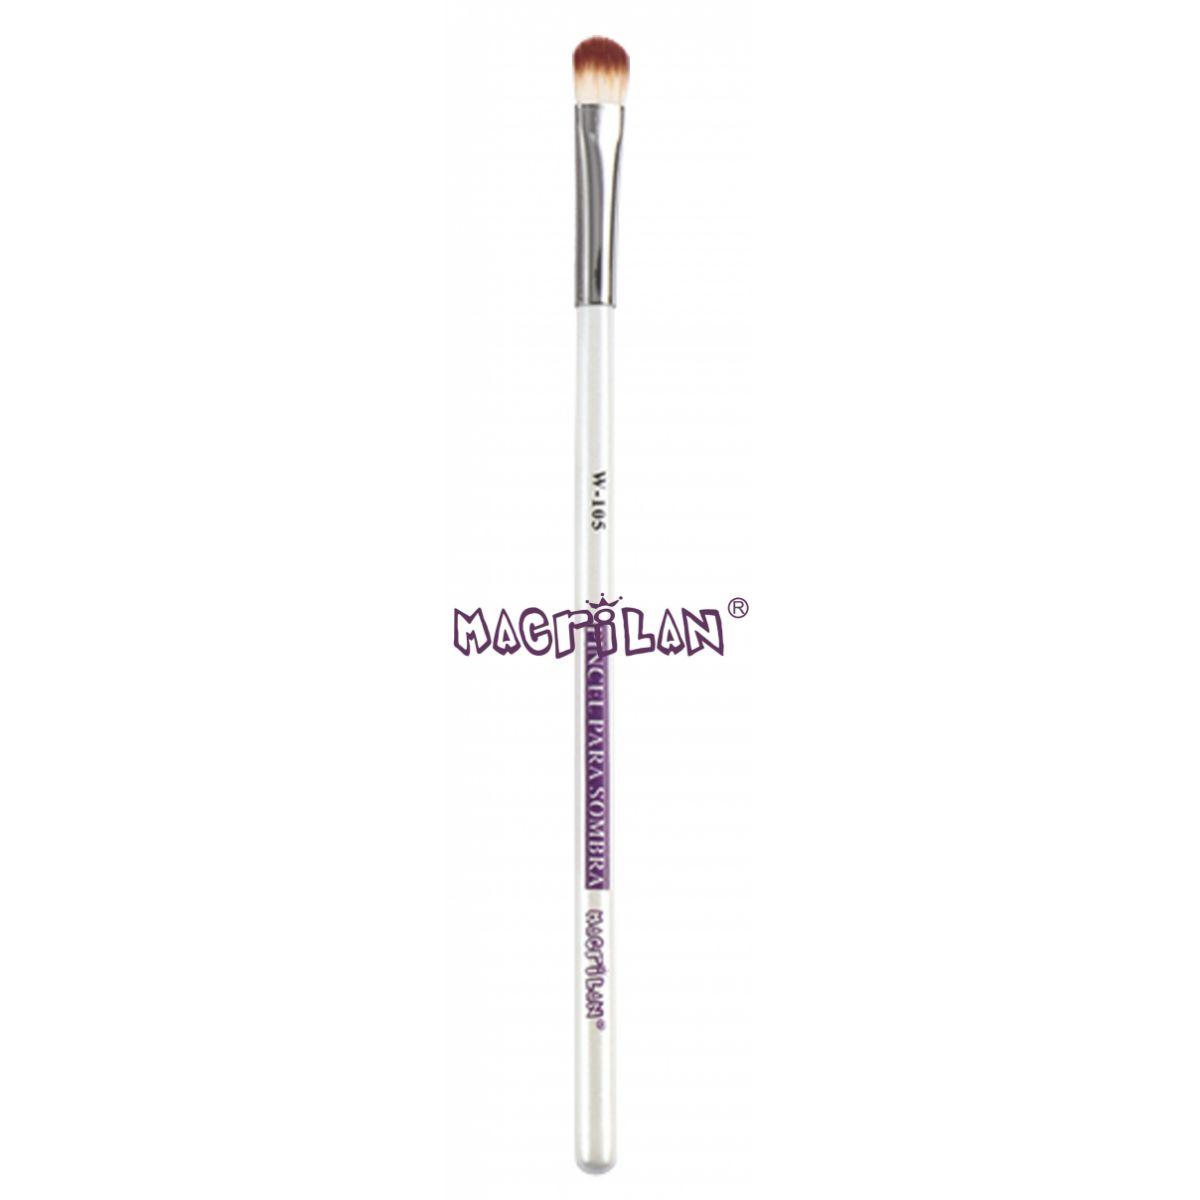 Pincel Macrilan W105 para Sombra - Macrilan Qualidade Profissional